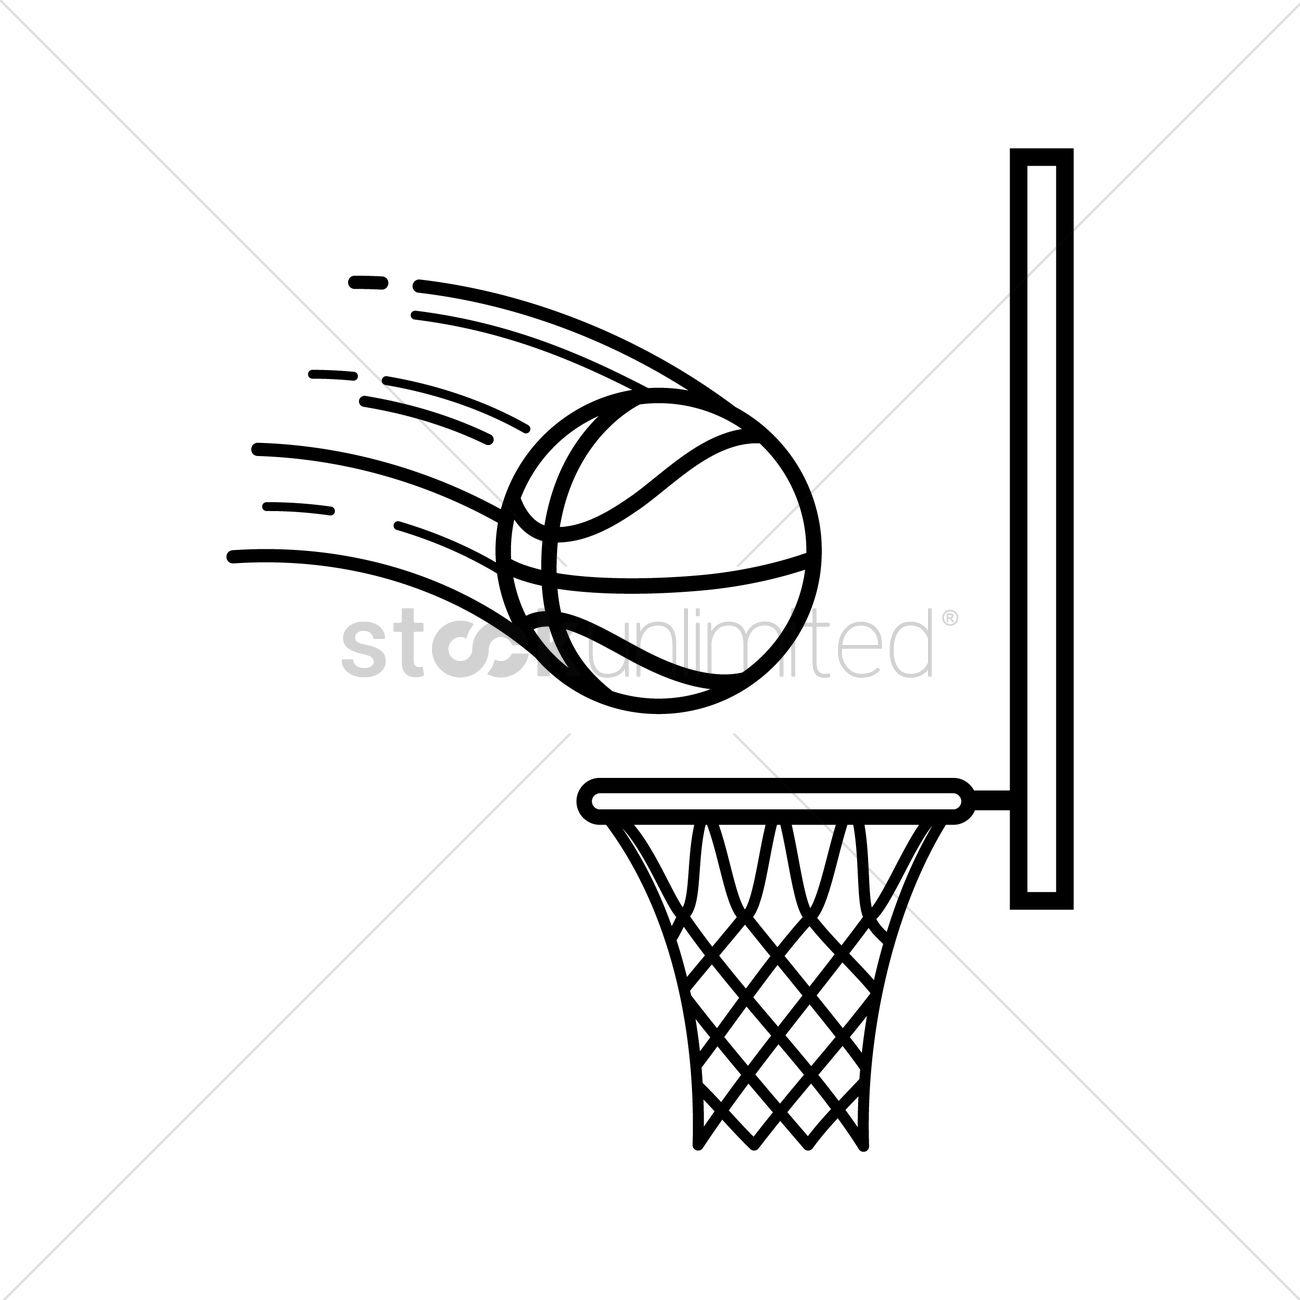 Basketball Going Into Hoop Vector Image